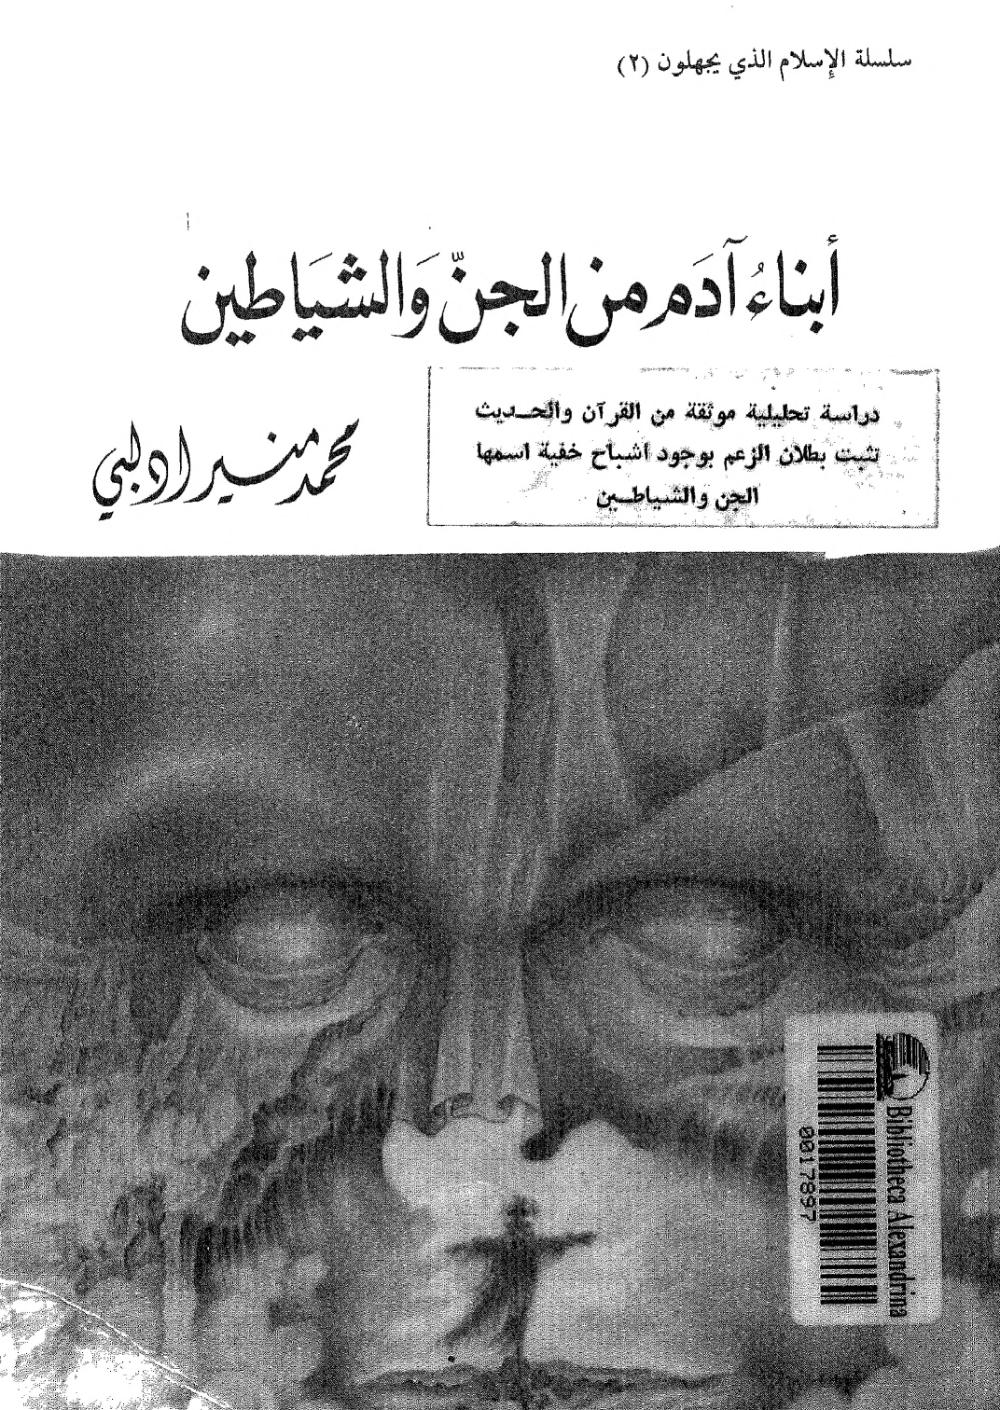 أبناء آدم من الجن و الشياطين محمد منير إدلبي Free Download Borrow And Streaming Internet Archive Ebooks Free Books Pdf Books Reading Arabic Books